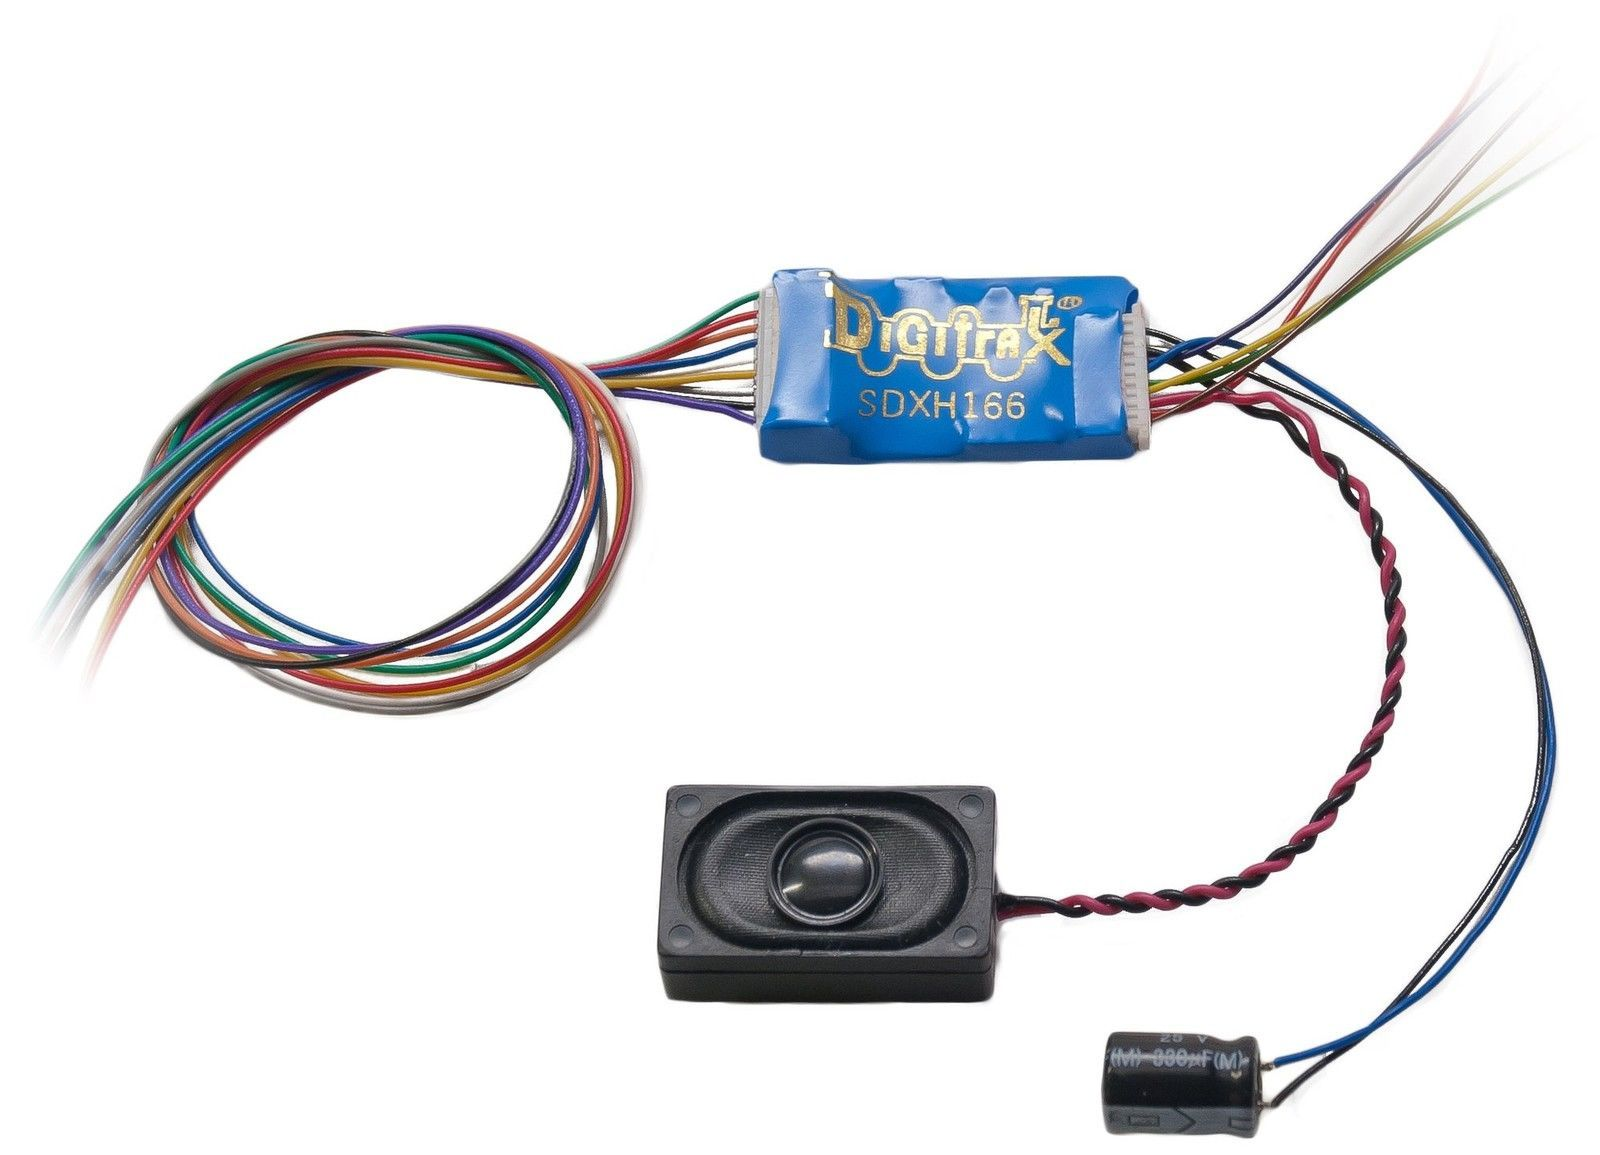 decoders 180342 digitrax sdxh166d ho premium dcc motor and sound decoders 180342 digitrax sdxh166d ho premium dcc motor and sound decoder and speaker modelrrsupply